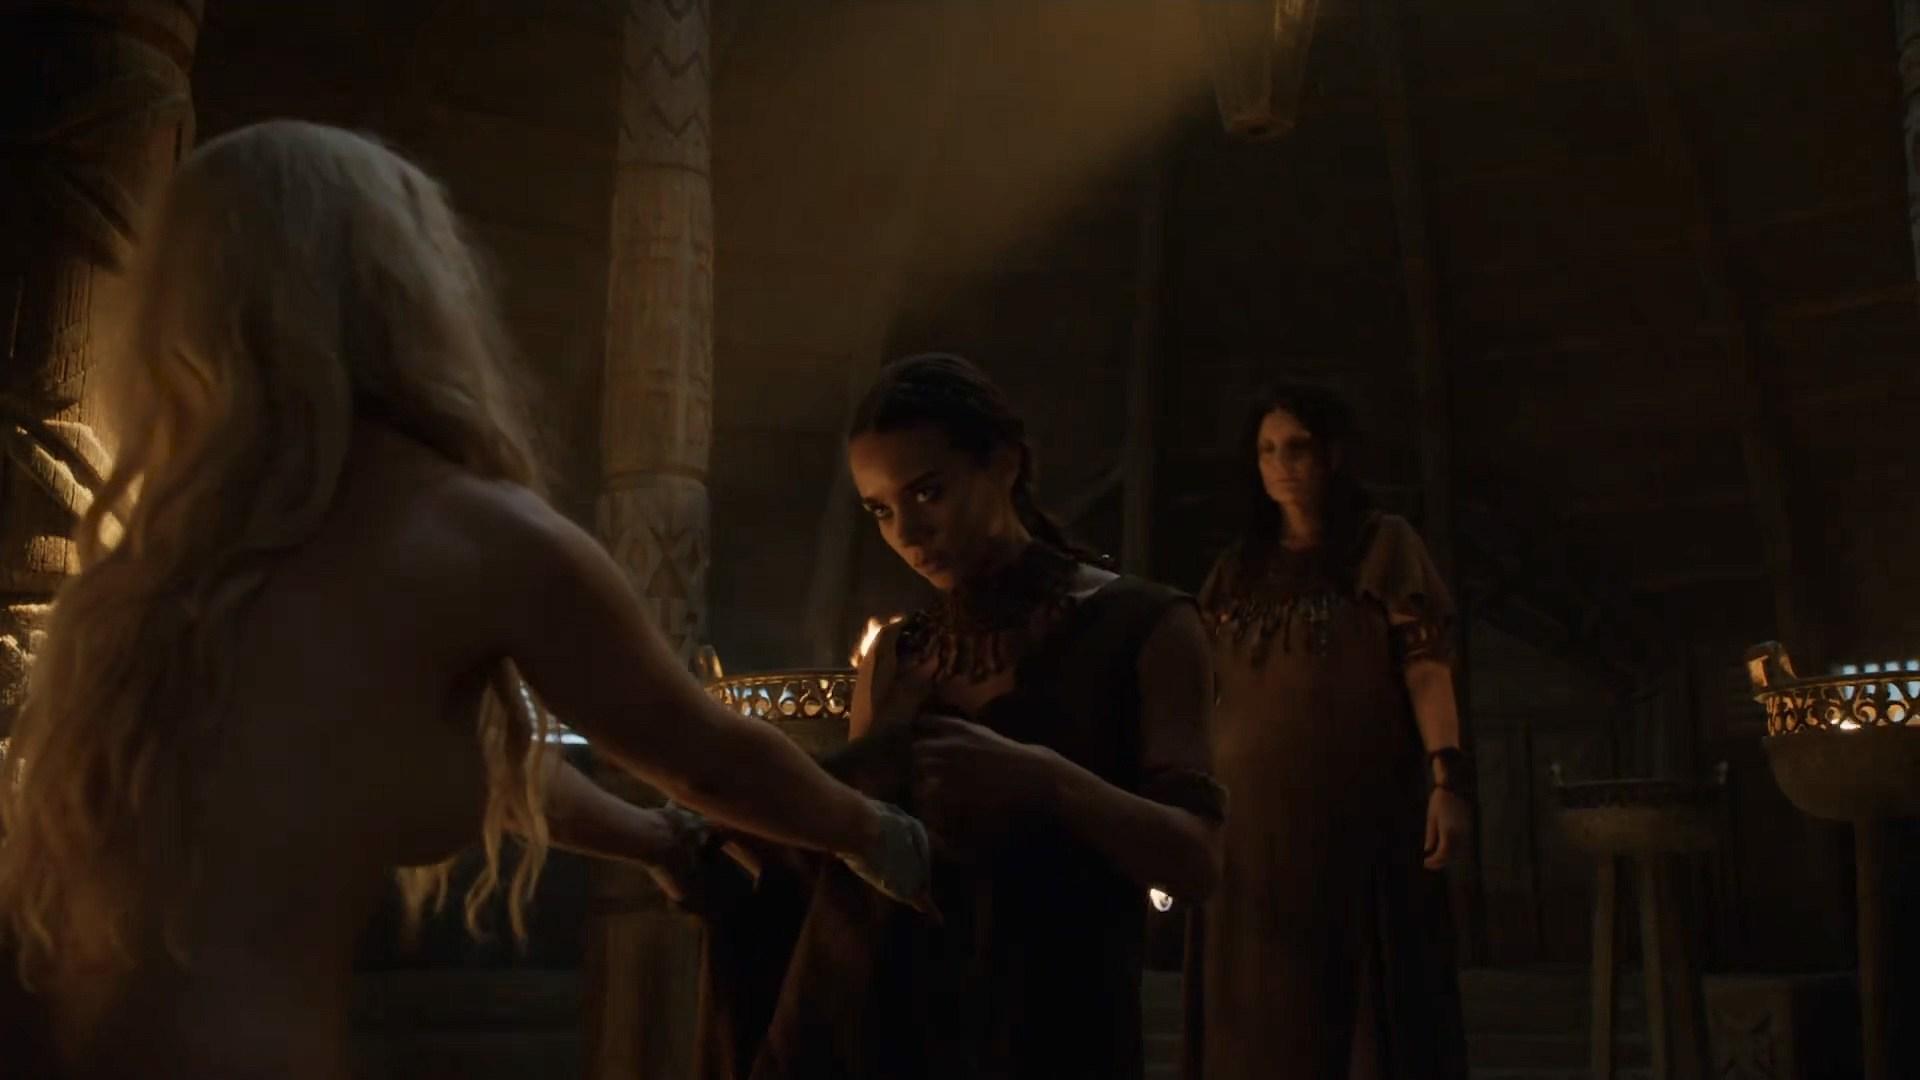 0313180018224_06_Emilia-Clarke-nude-barley-side-boob-Game-of-Thrones-2016-s603-HDTV-1080p-5.jpg